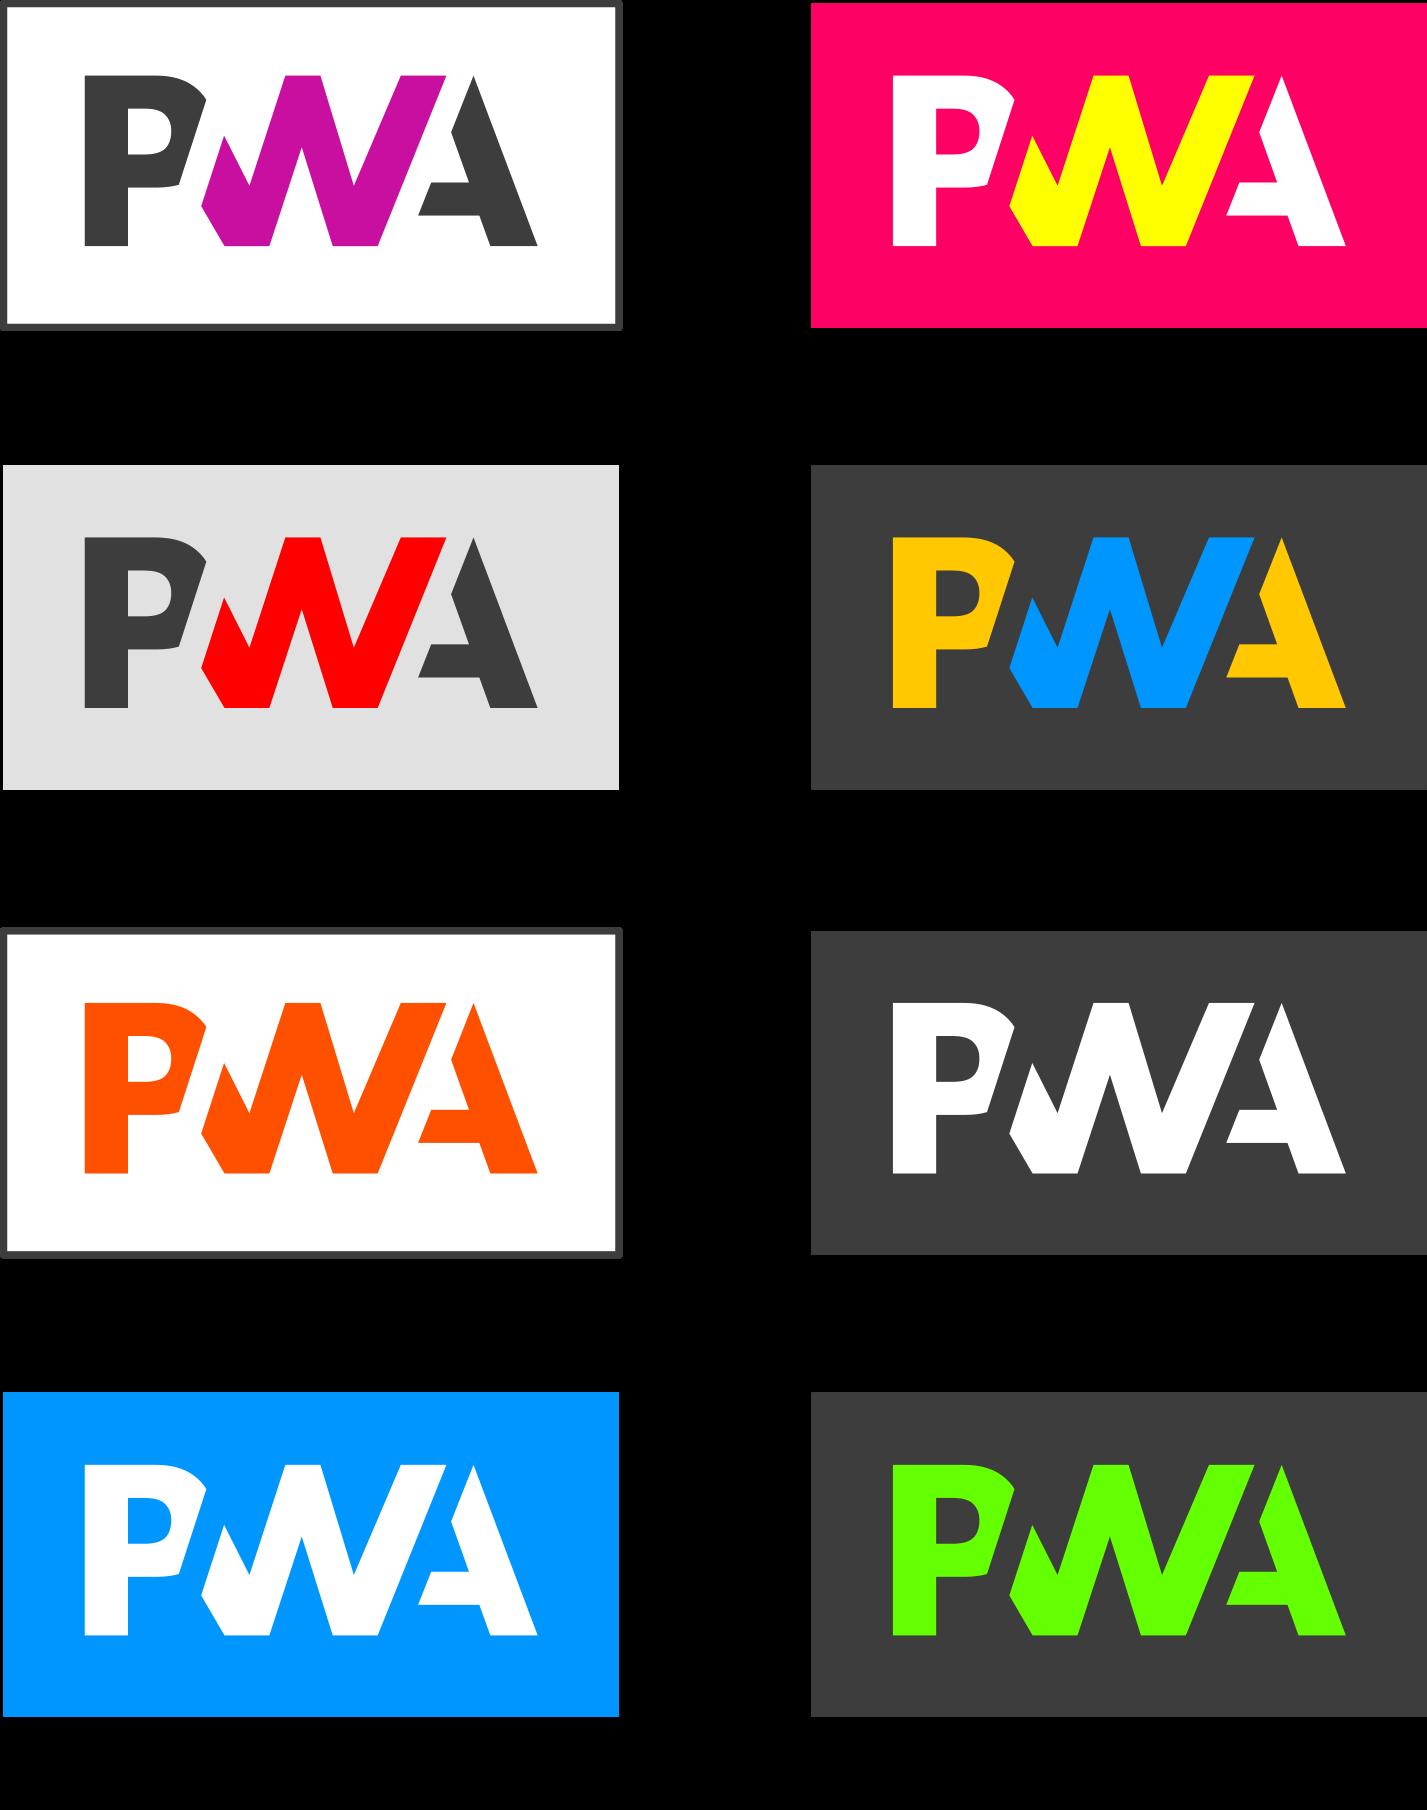 pwasw